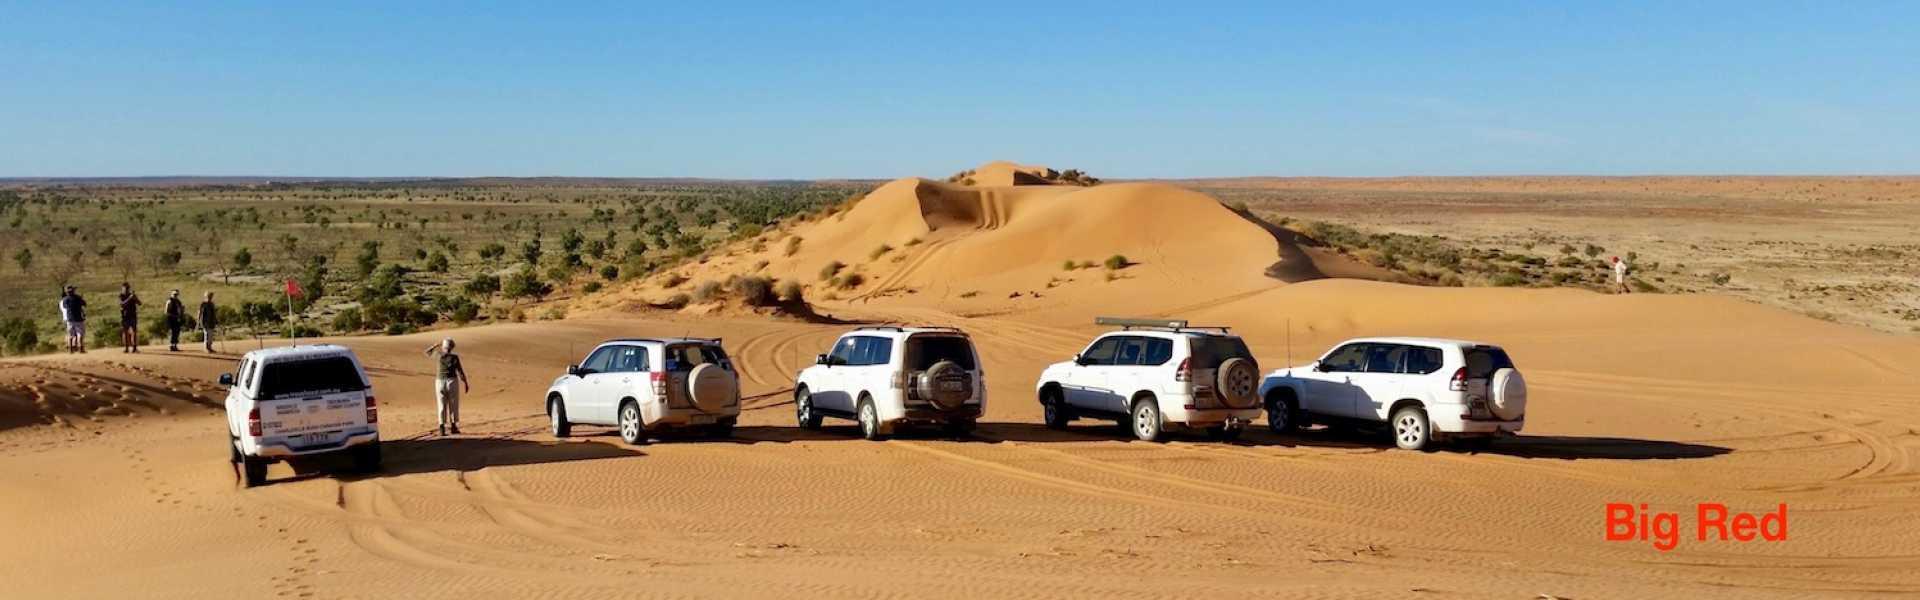 Kui Parks, Charleville Caravan Park, Outback Tours